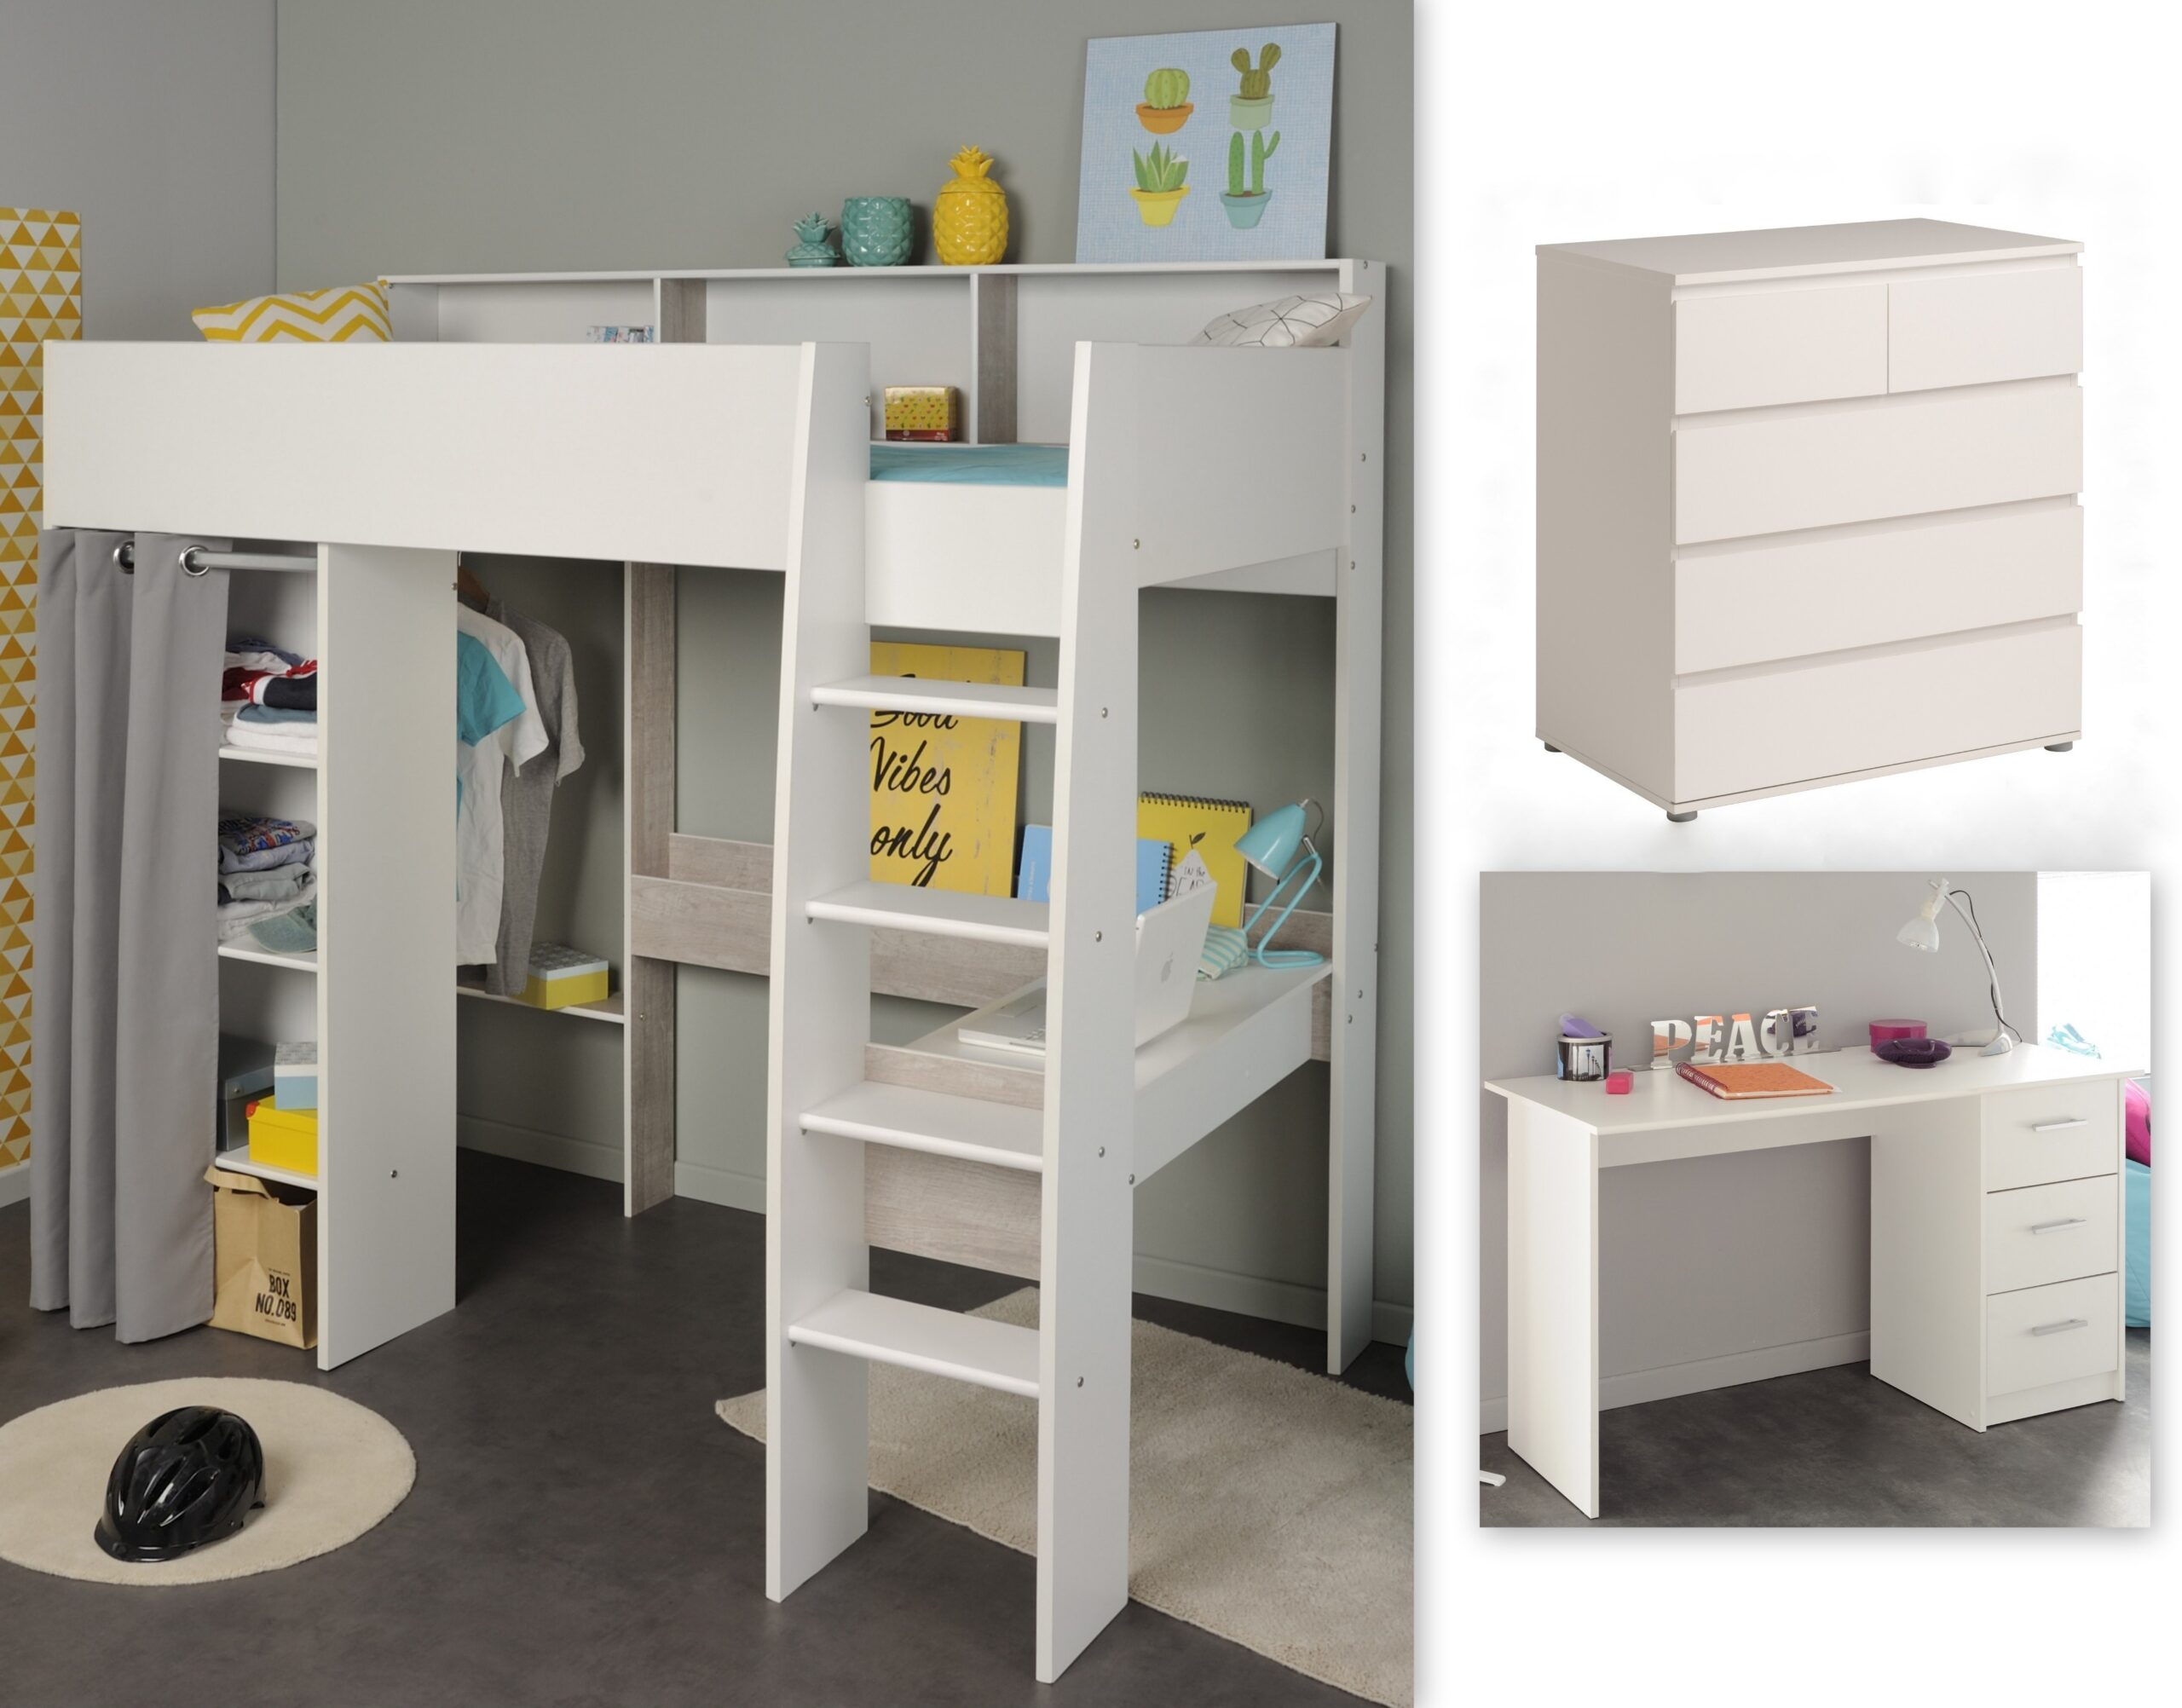 Full Size of Kinderzimmer Set 3 Tlg Inkl 90x200 Hochbett Regale Regal Weiß Sofa Kinderzimmer Hochbetten Kinderzimmer